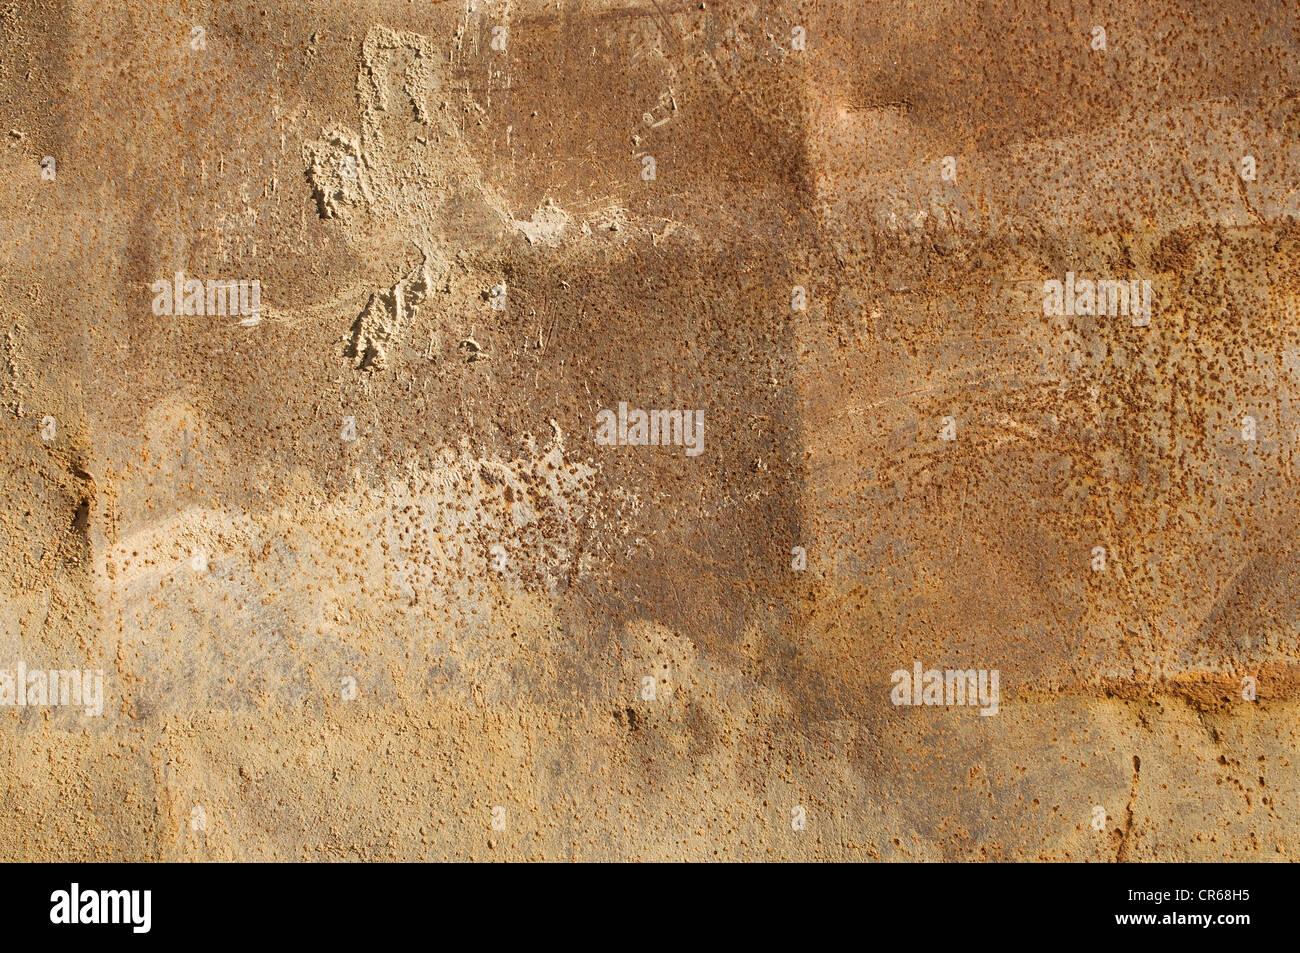 Superficie metálica oxidada, antecedentes Imagen De Stock